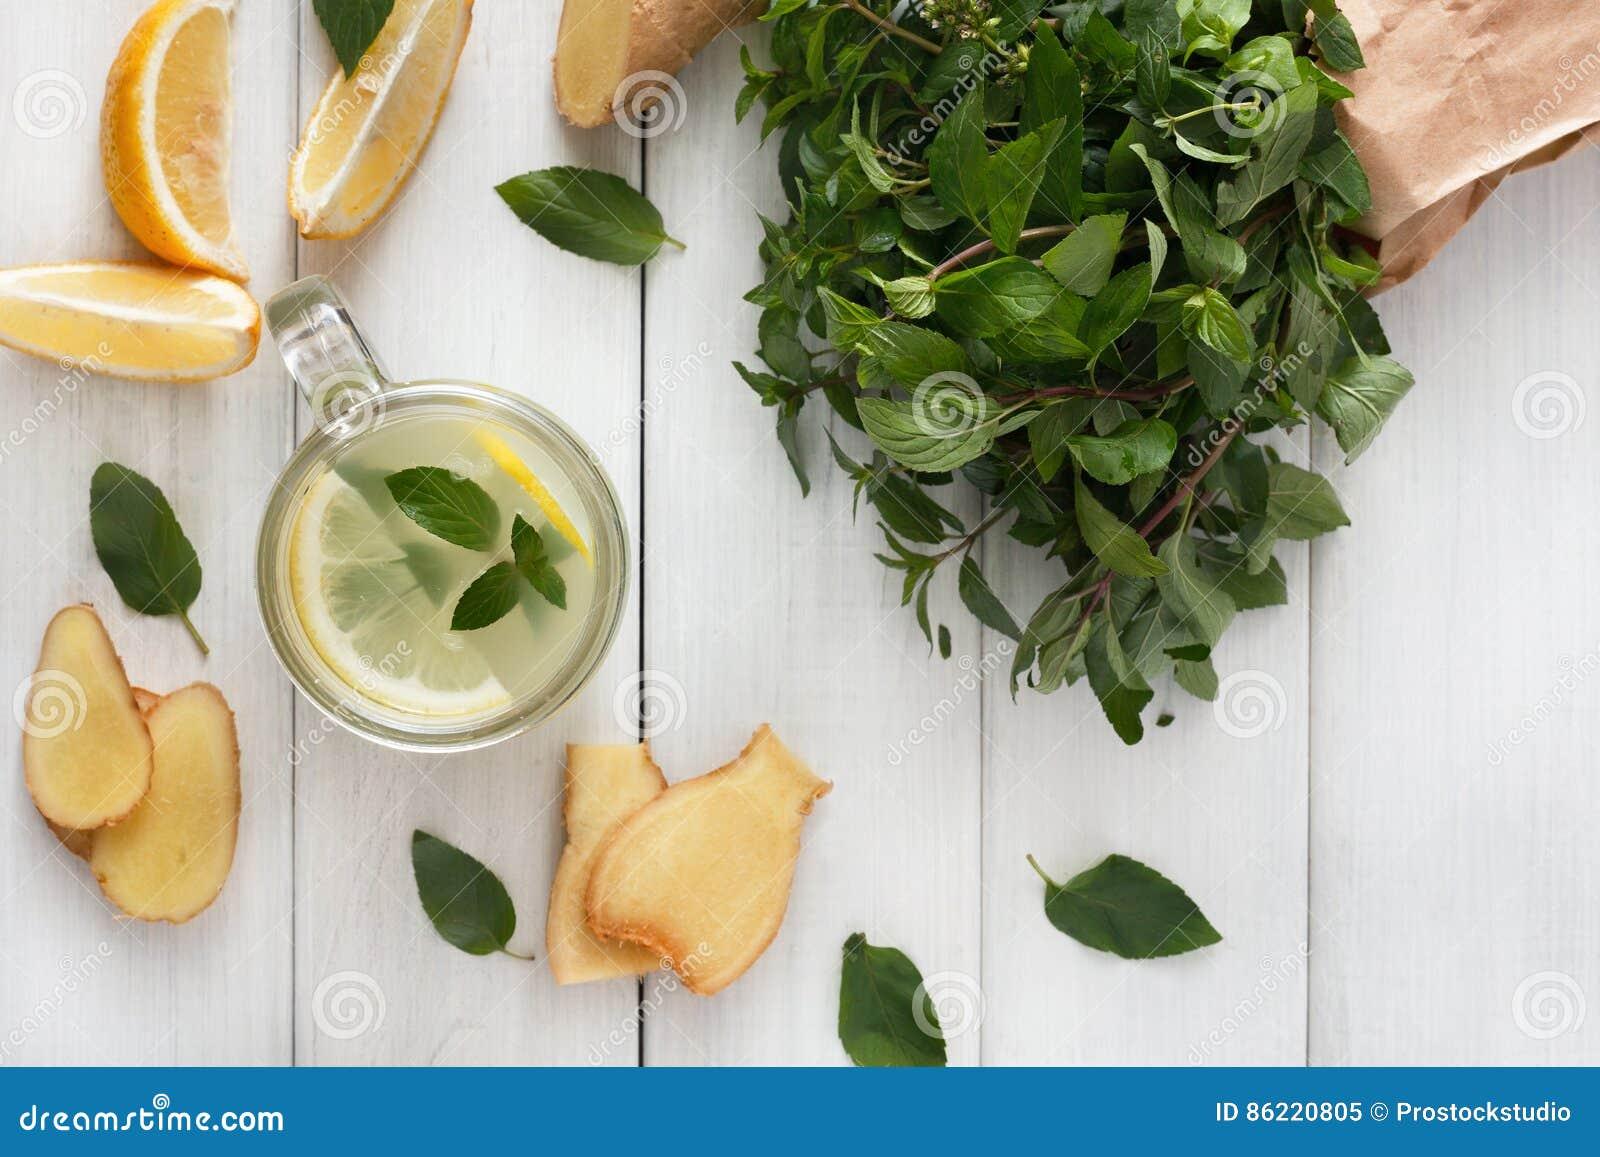 Detox Lemonade Smoothie Ingredients On White Wood Background